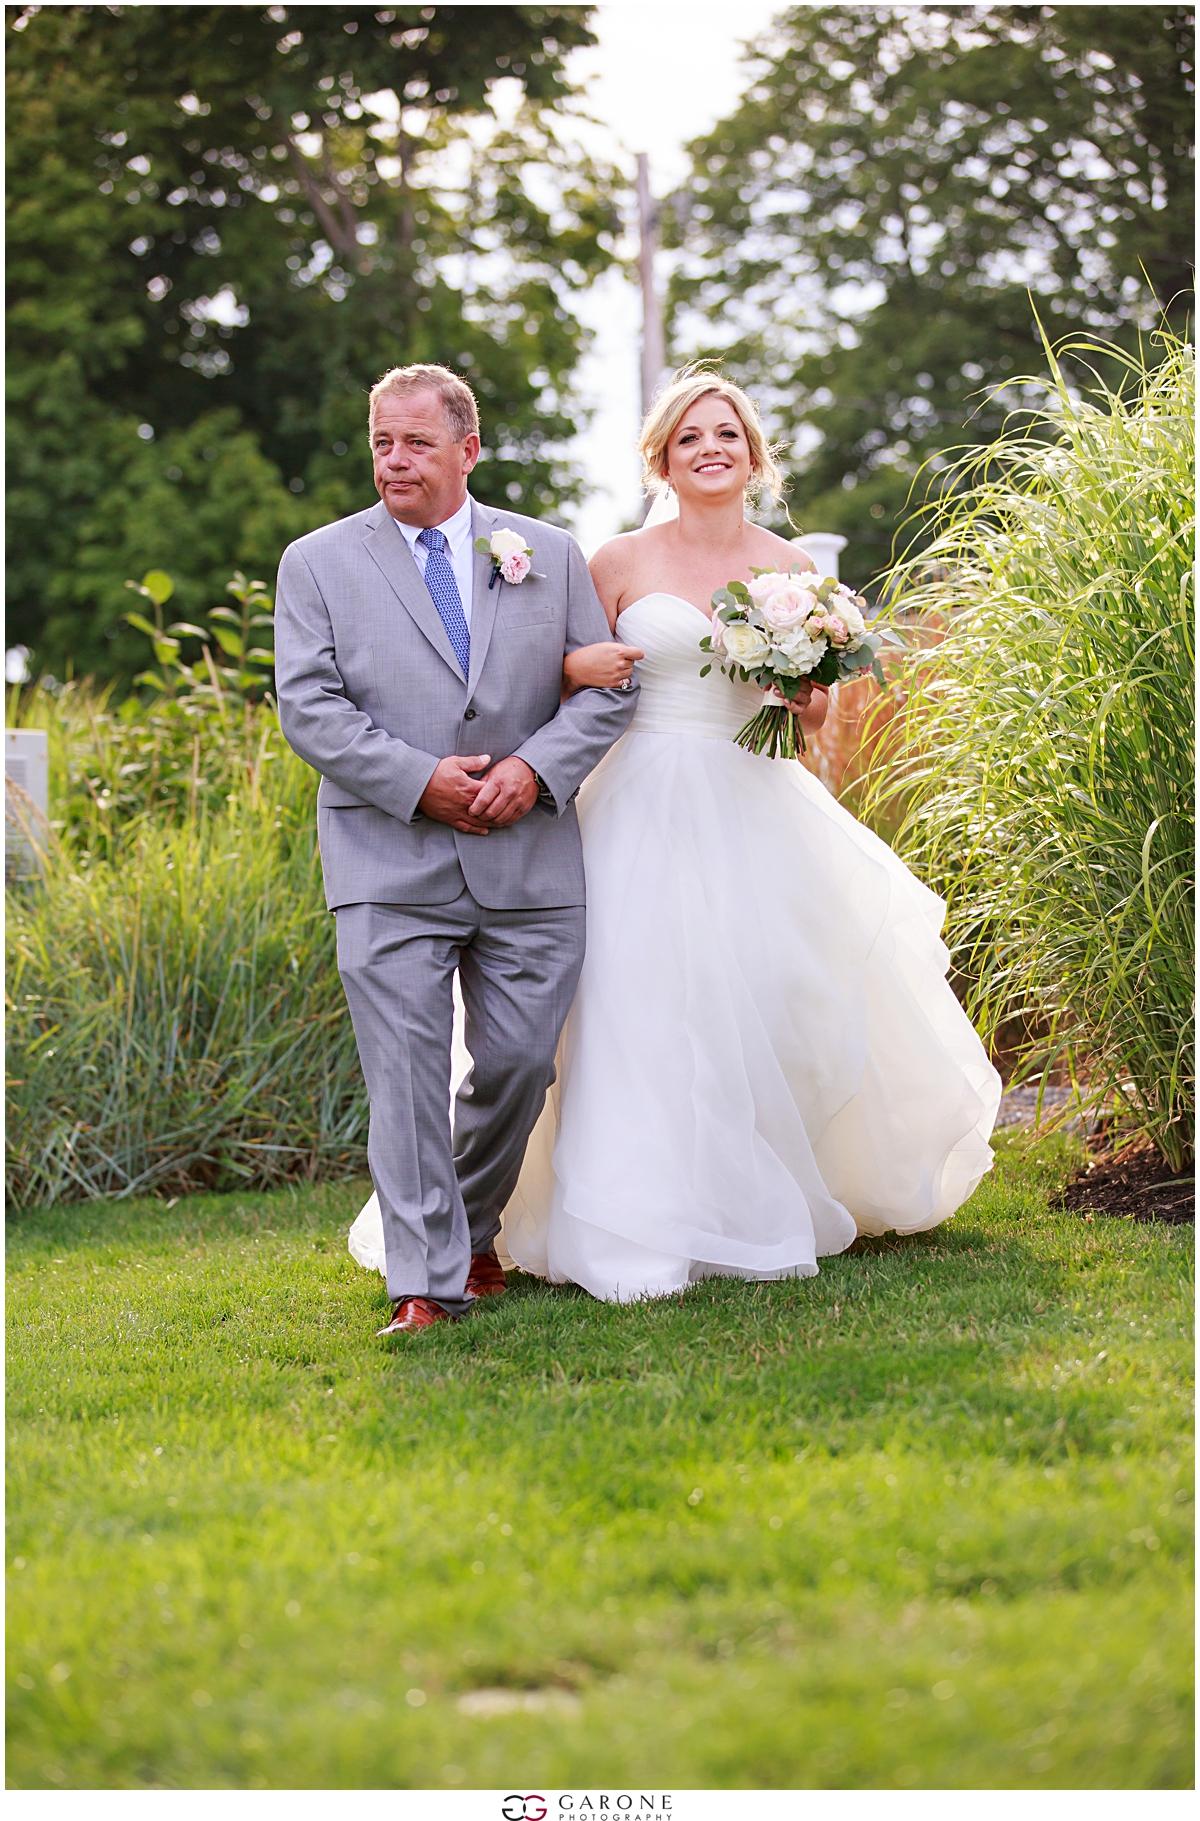 Union_Bluff_Hotel_York_Maine_Wedding_Photography_Beach_Wedding_0017.jpg